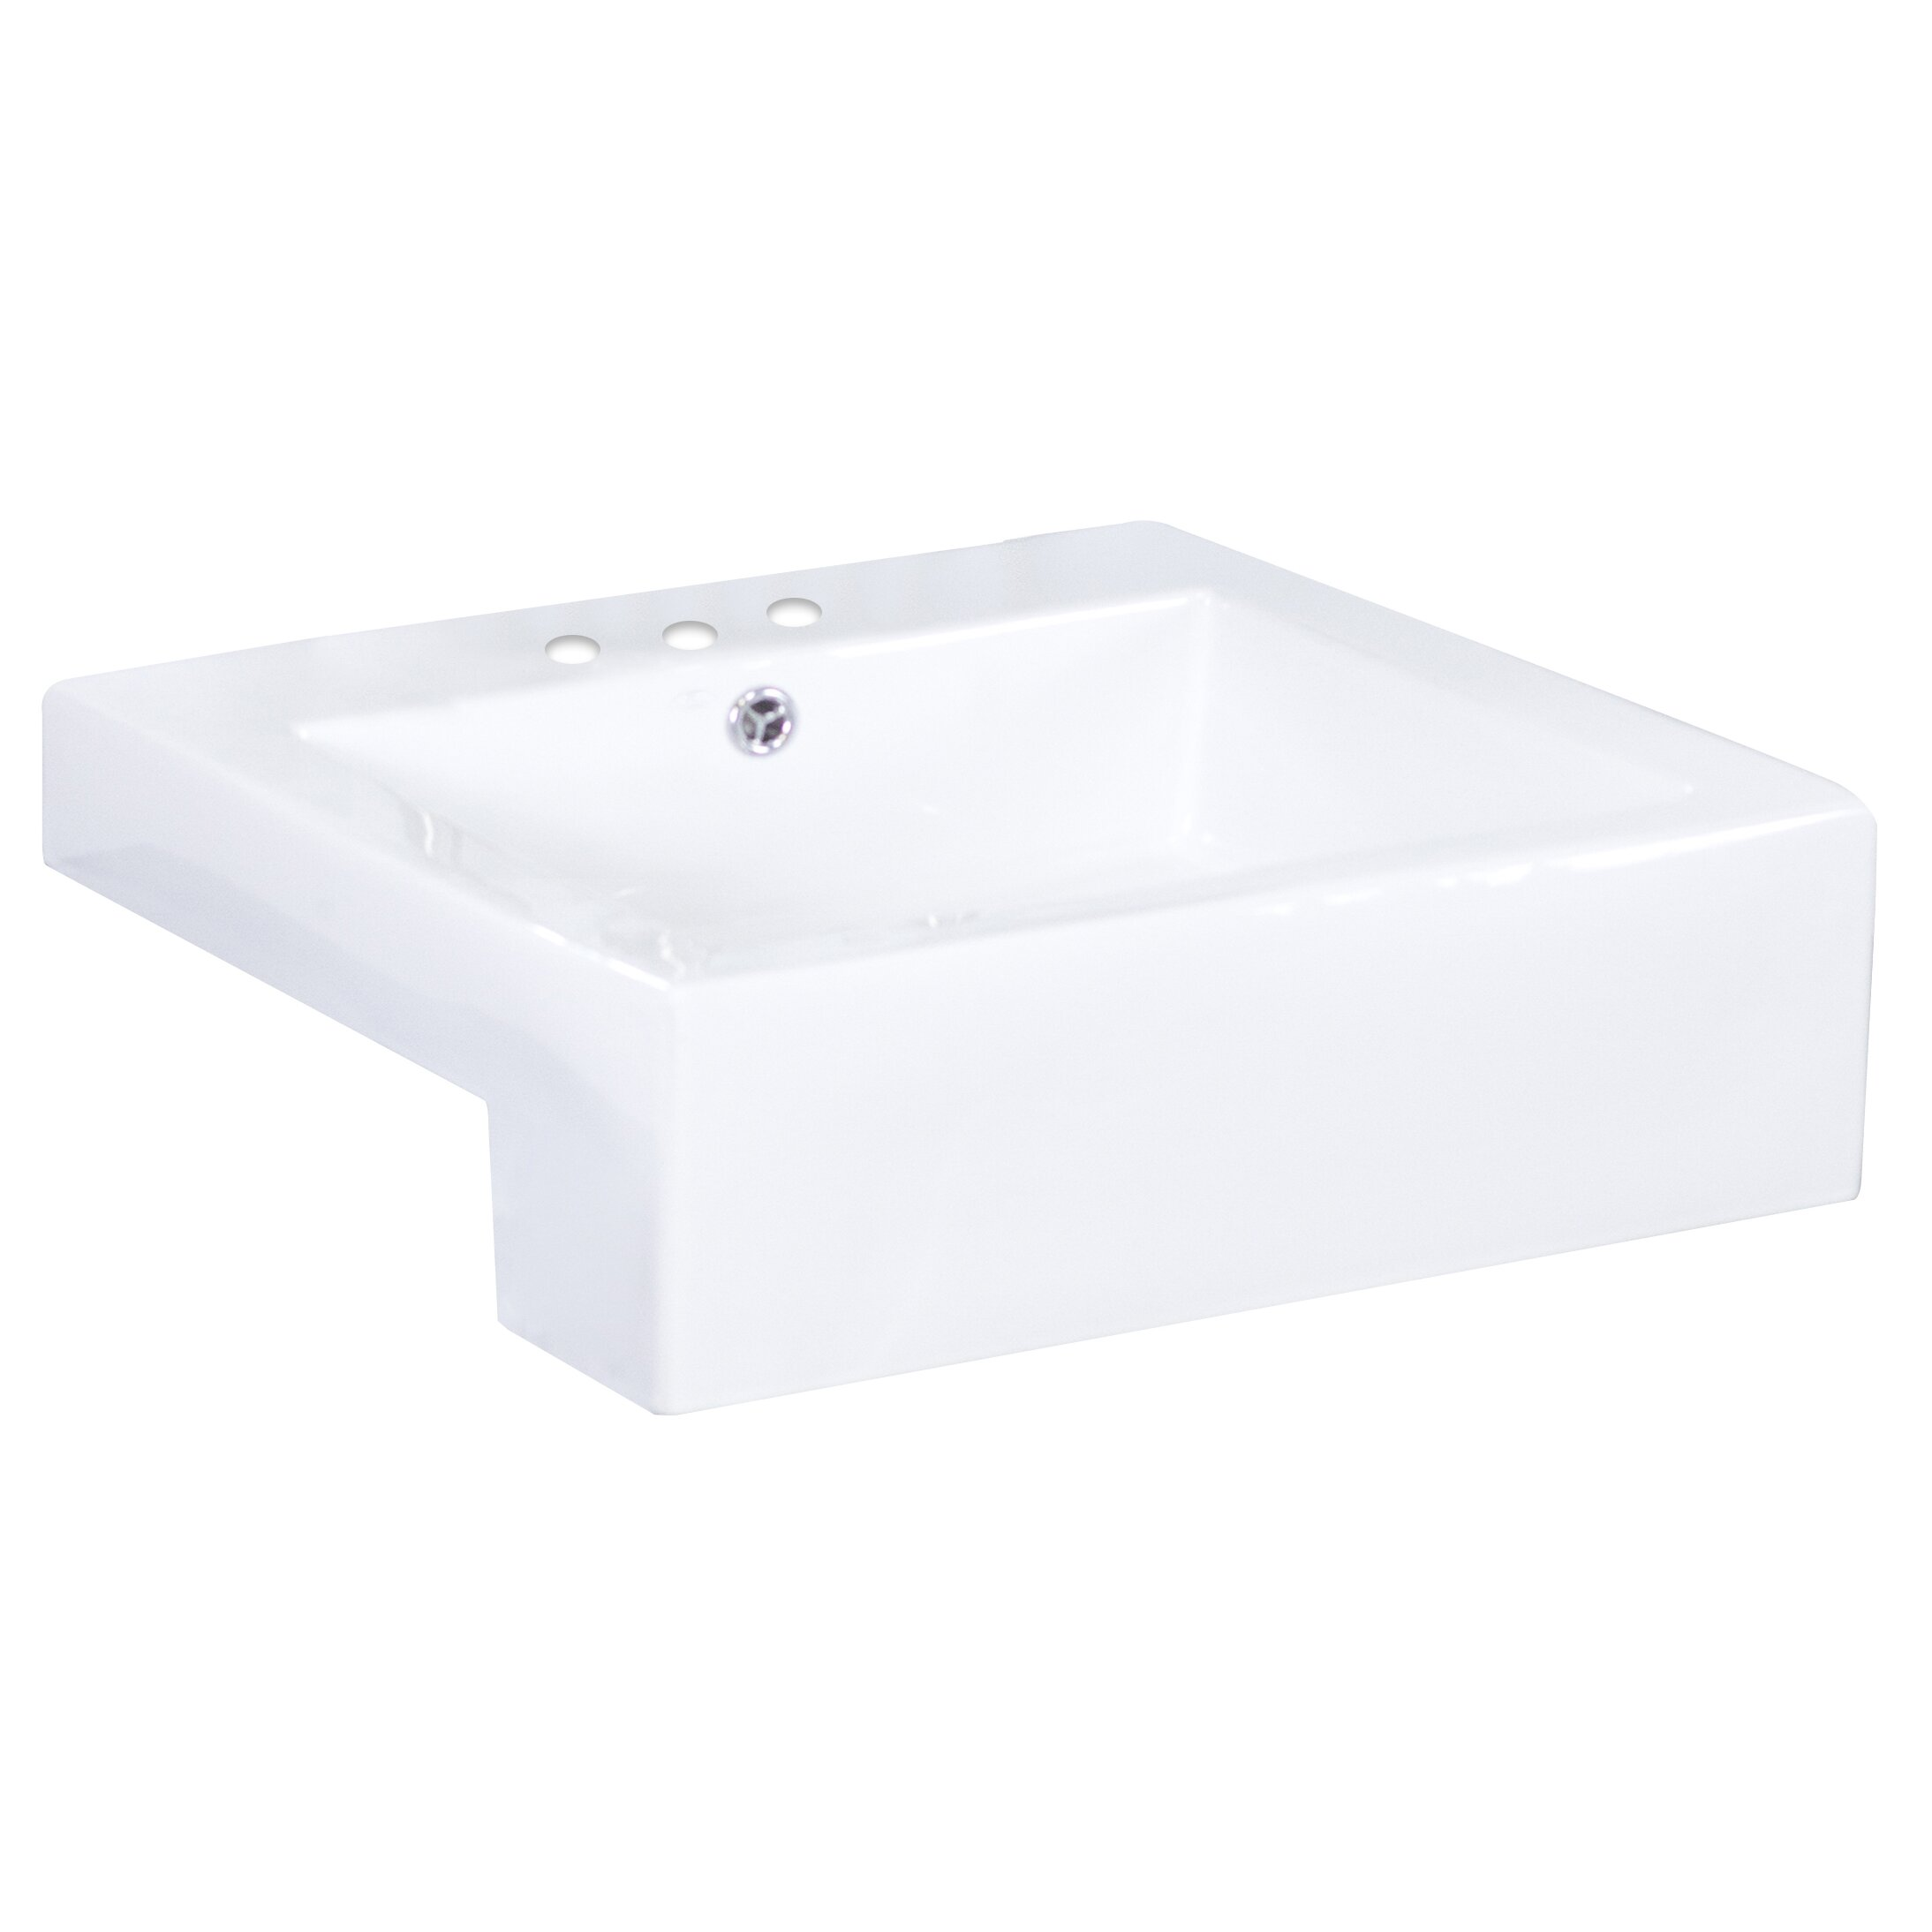 Square Vessel Bathroom Sink by American Imaginations